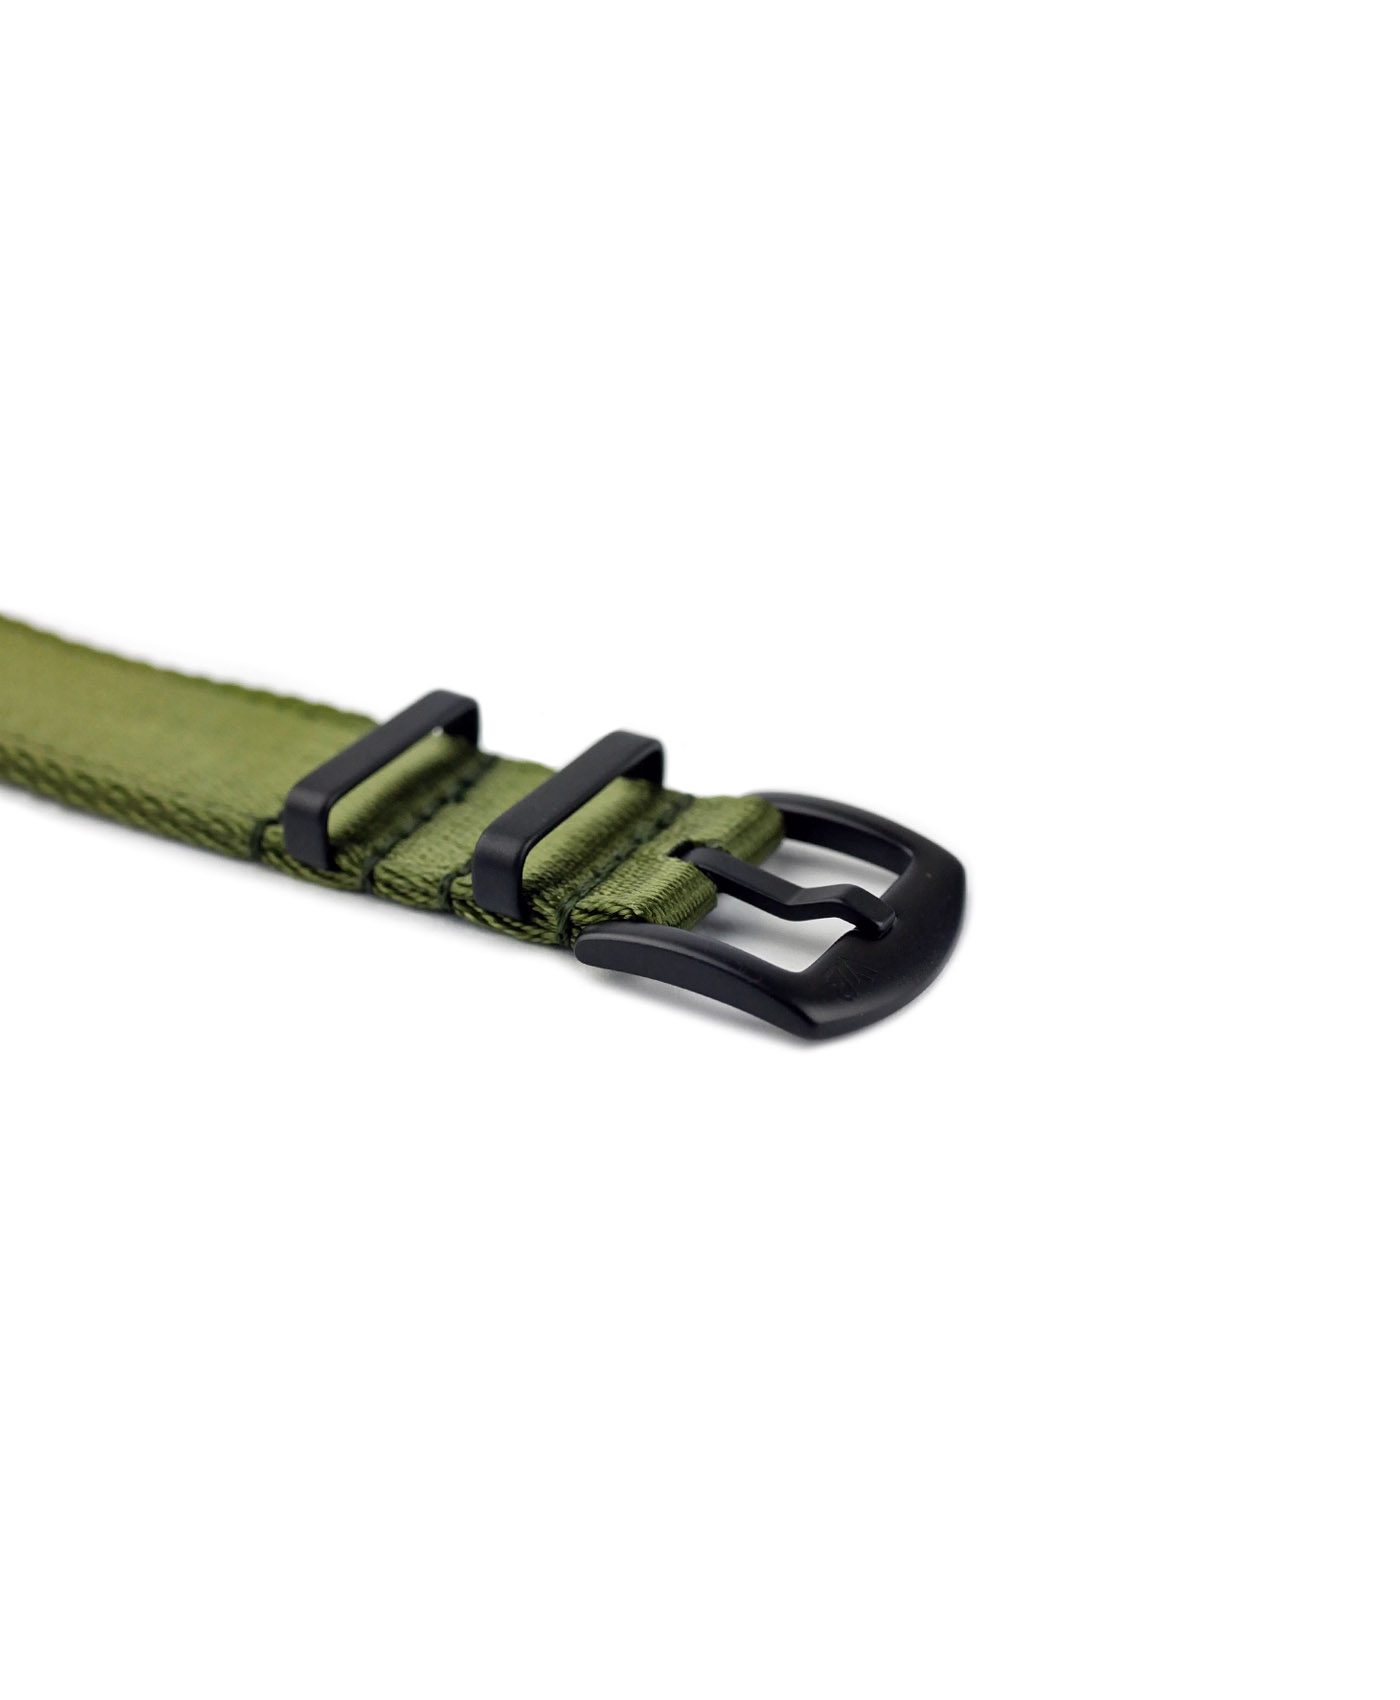 WB_Two_Piece_Nato_straps_green_black_PVD_buckle